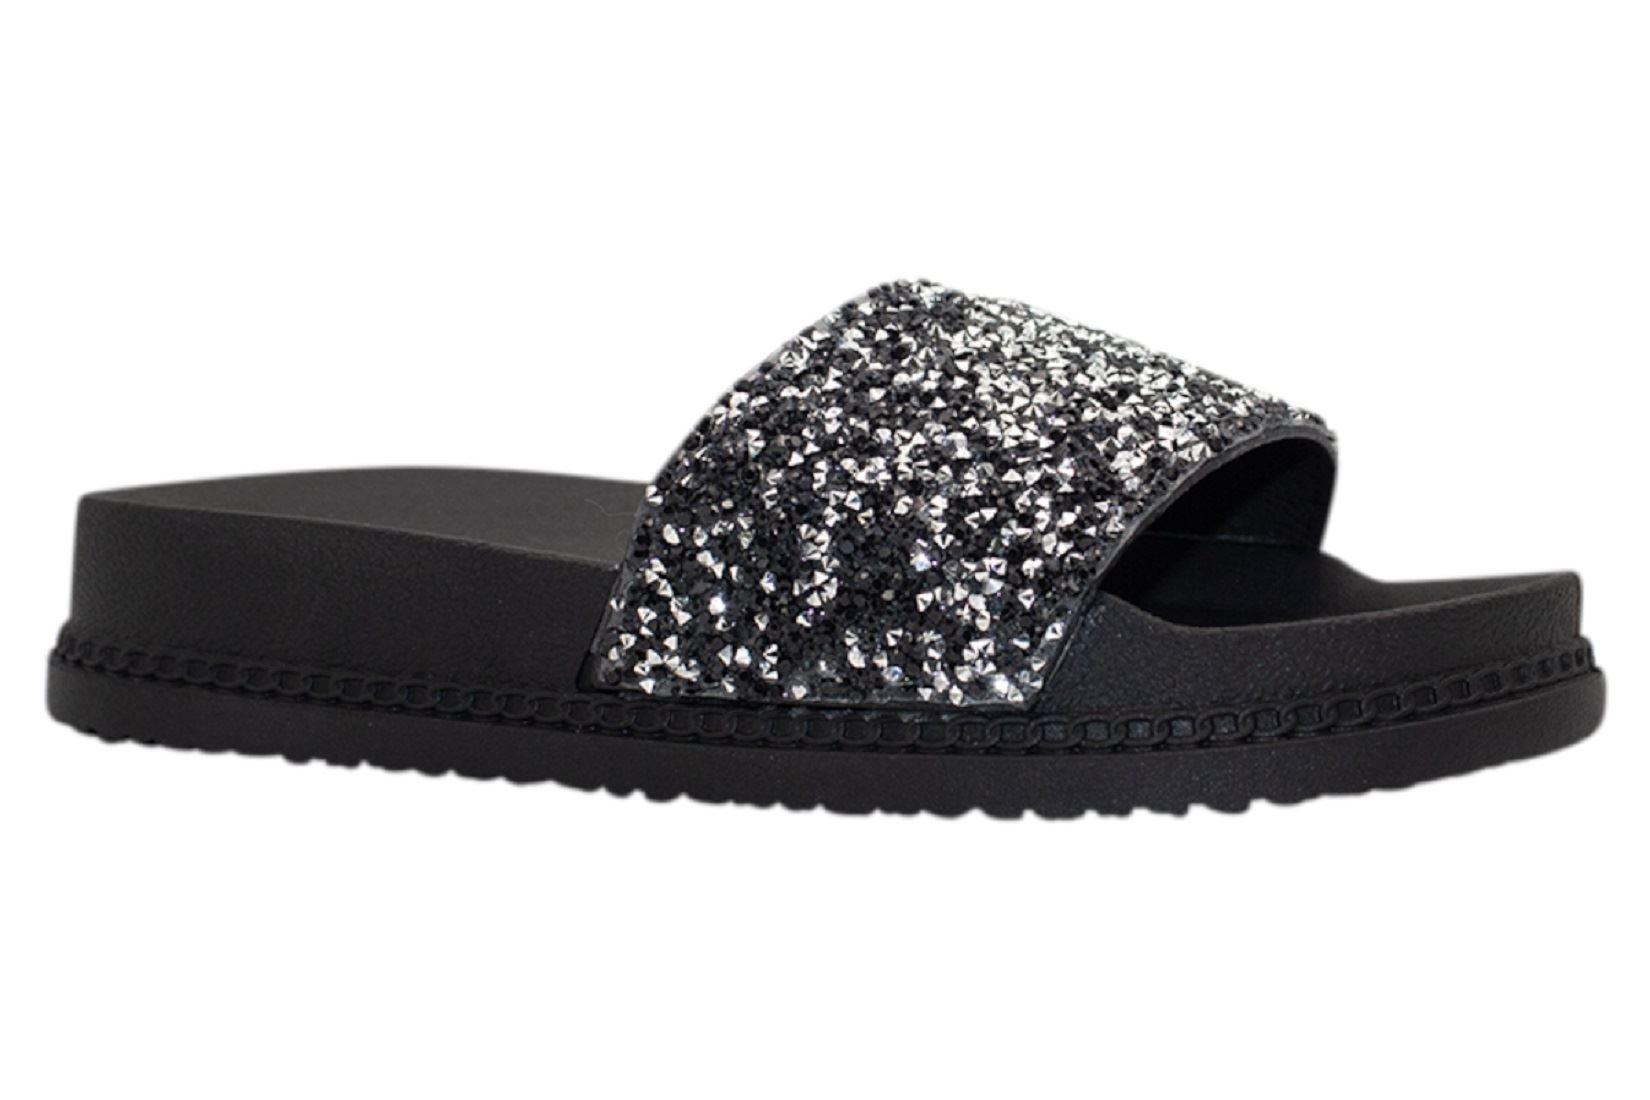 Womens-Sliders-Casual-Slippers-Mules-Ladies-Diamante-Flip-Flop-Sandals-Shoes thumbnail 28